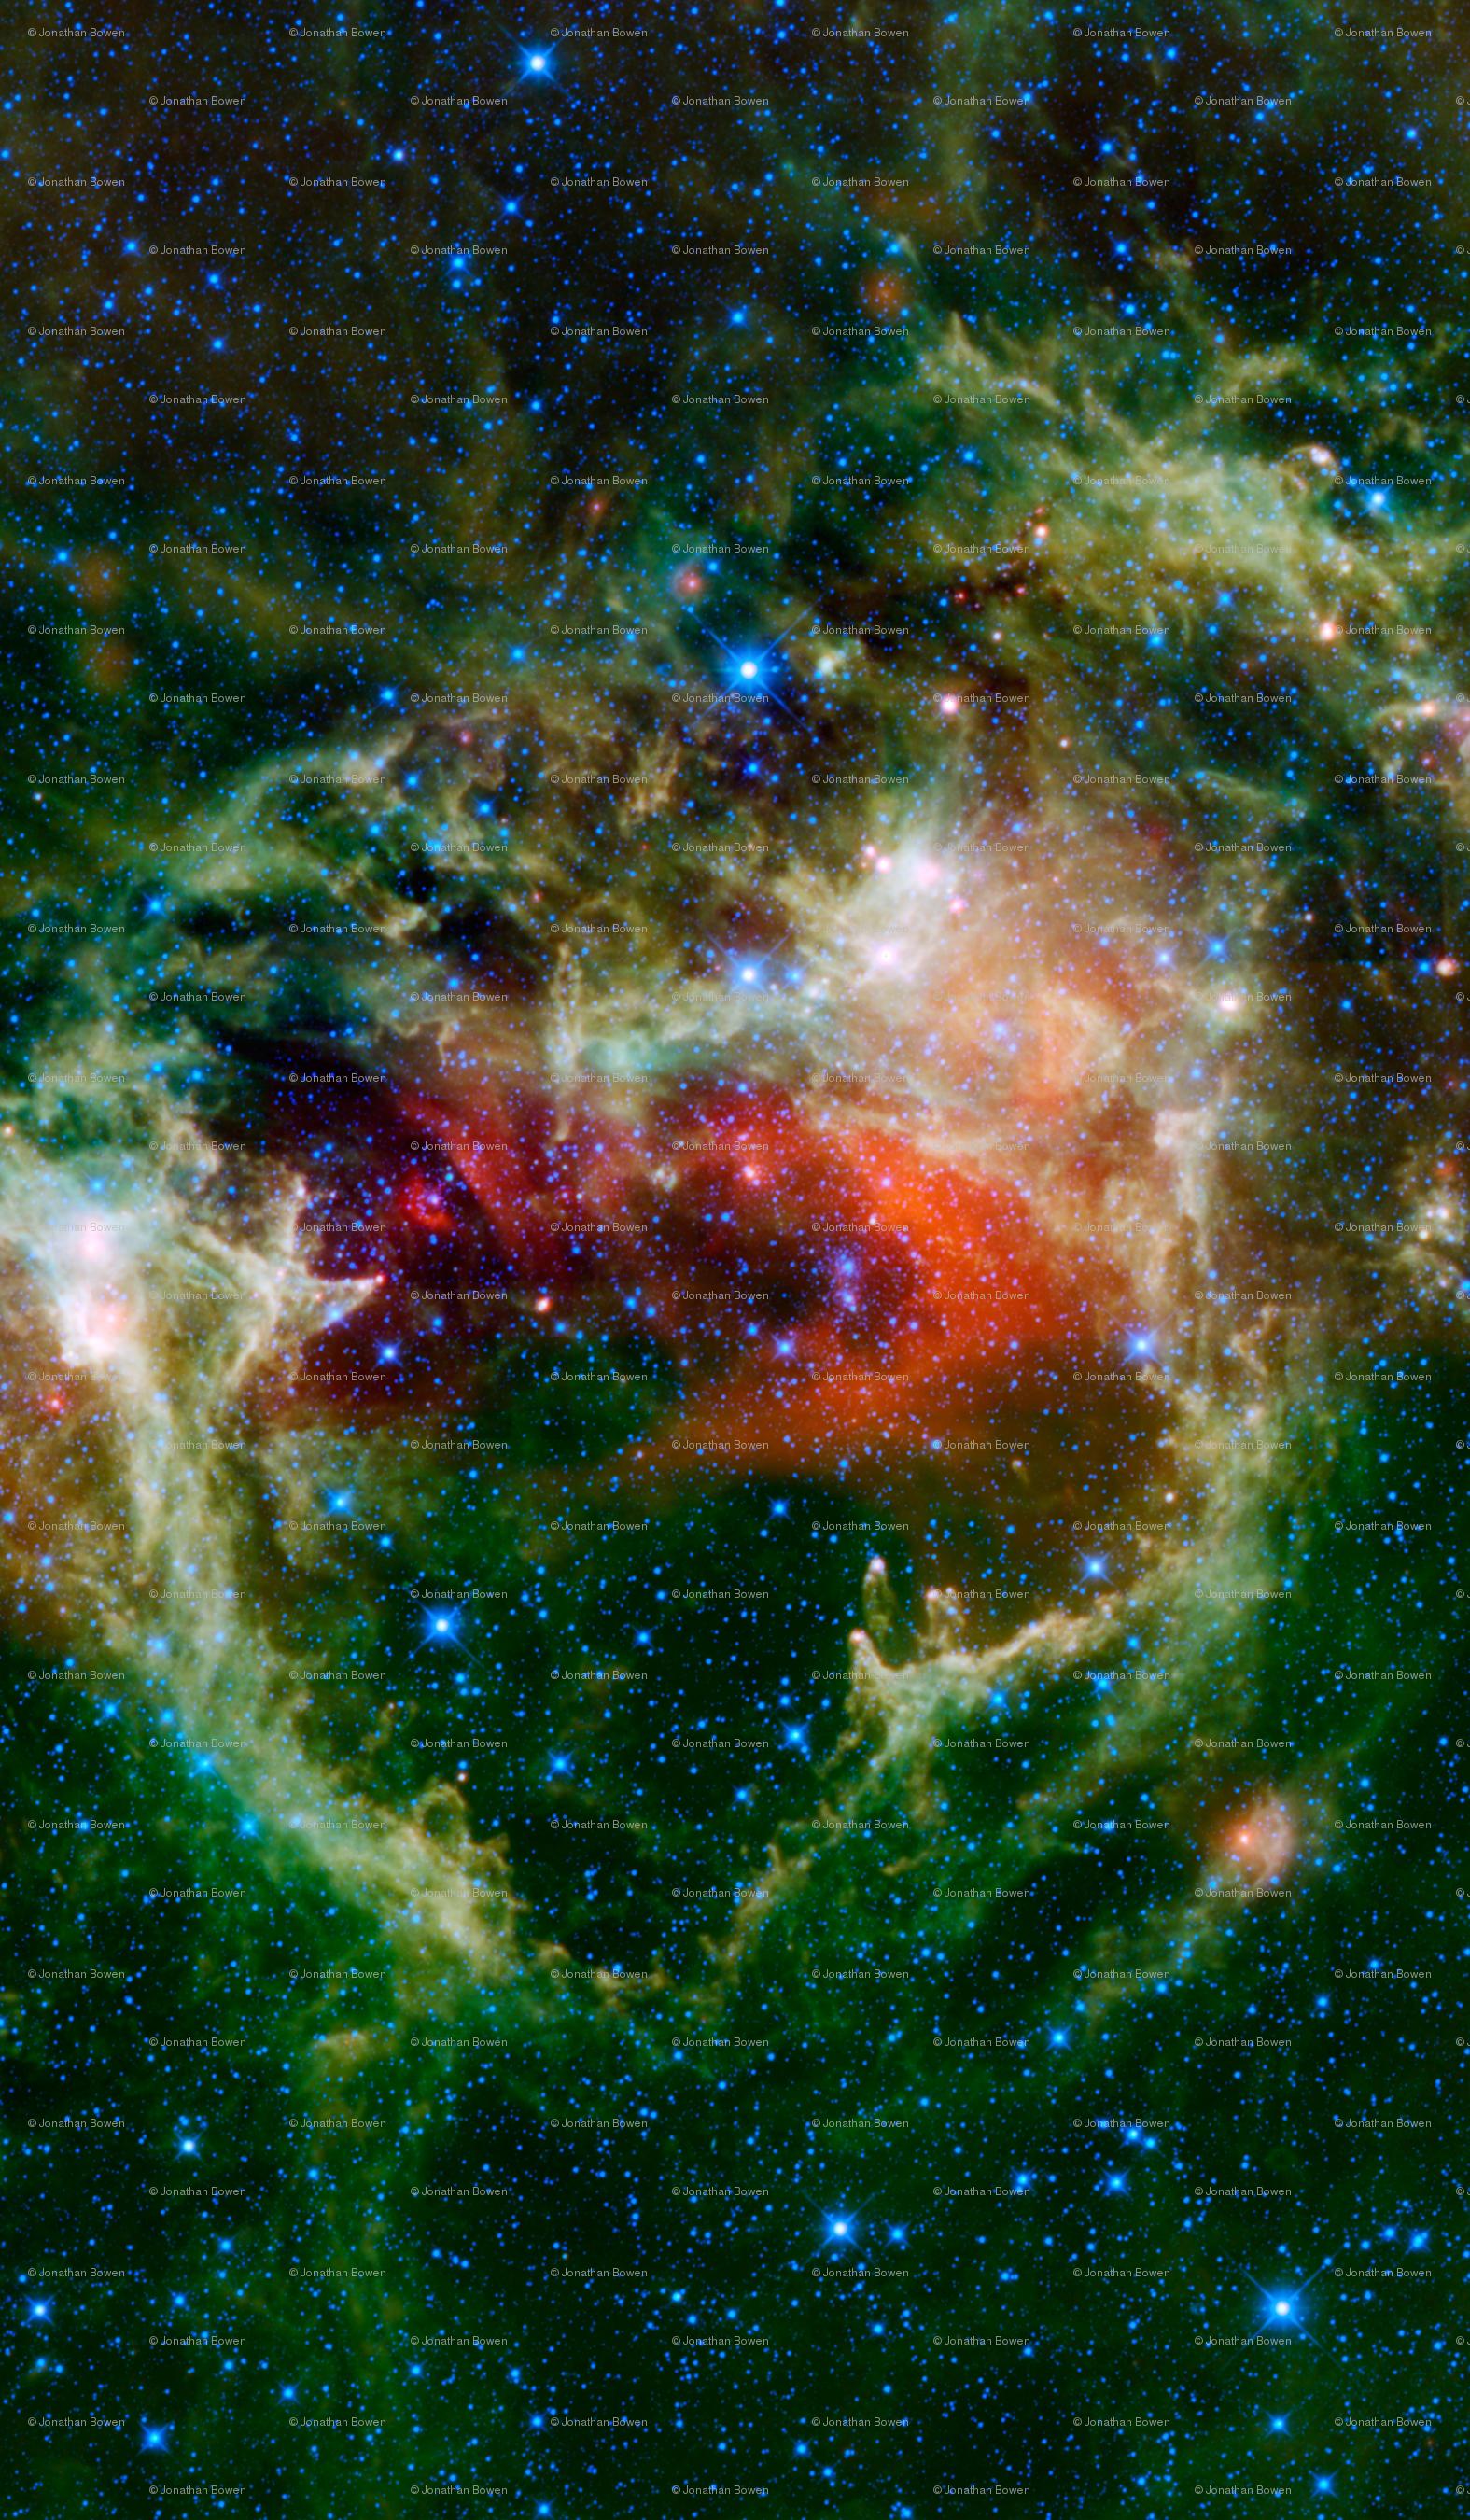 Galaxy nebula fabric page 3 pics about space for Nebula material